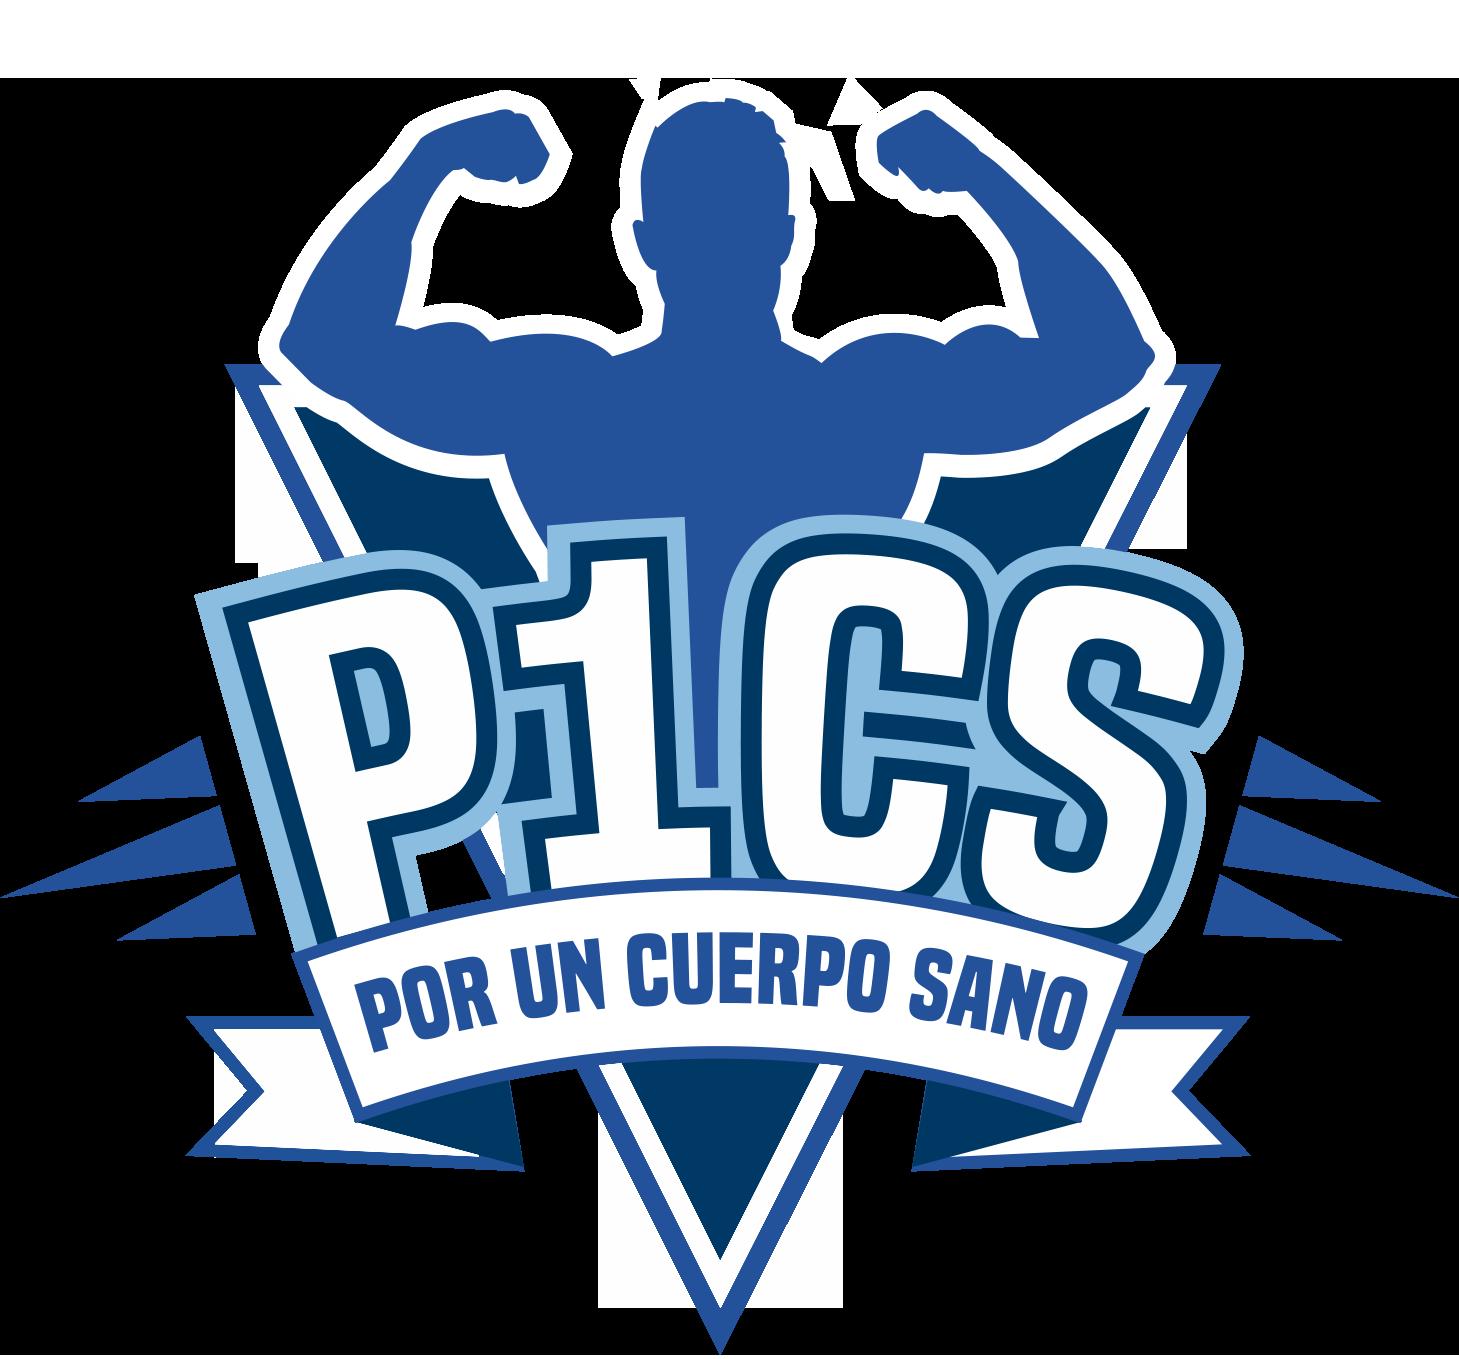 LOGO P1CS